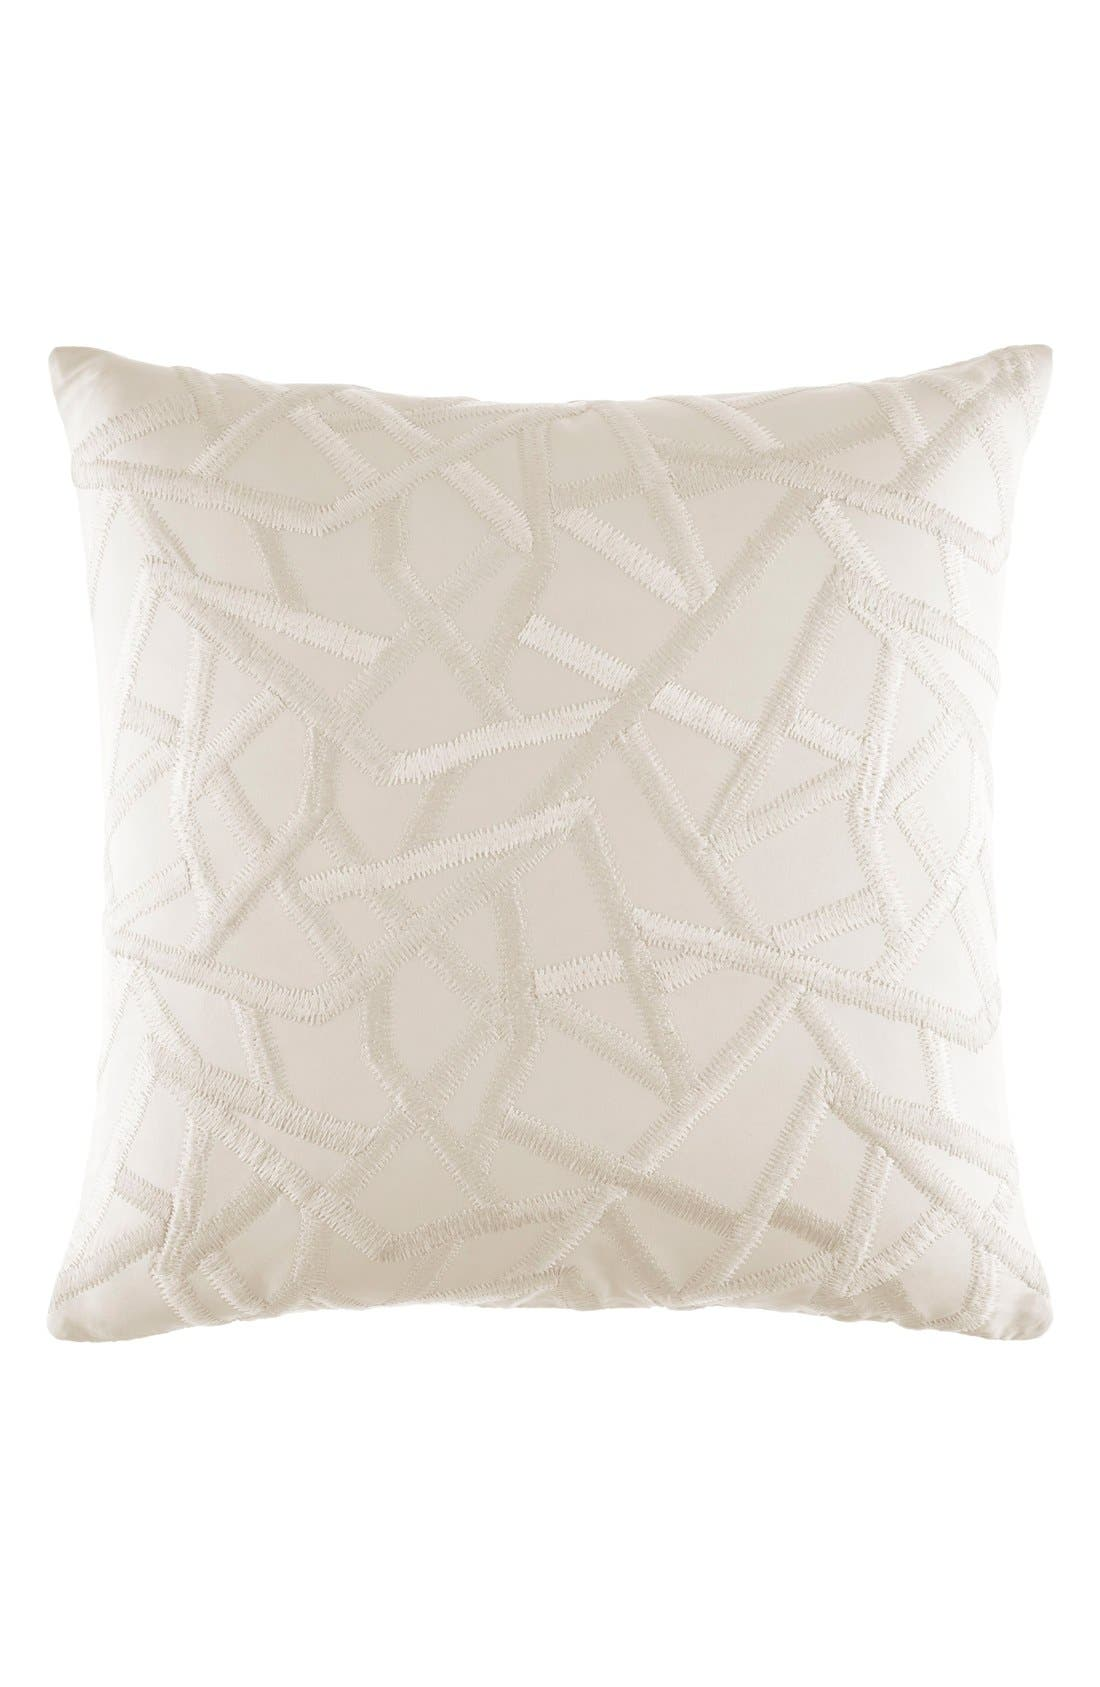 Main Image - Catherine Malandrino 'Optic' Pillow